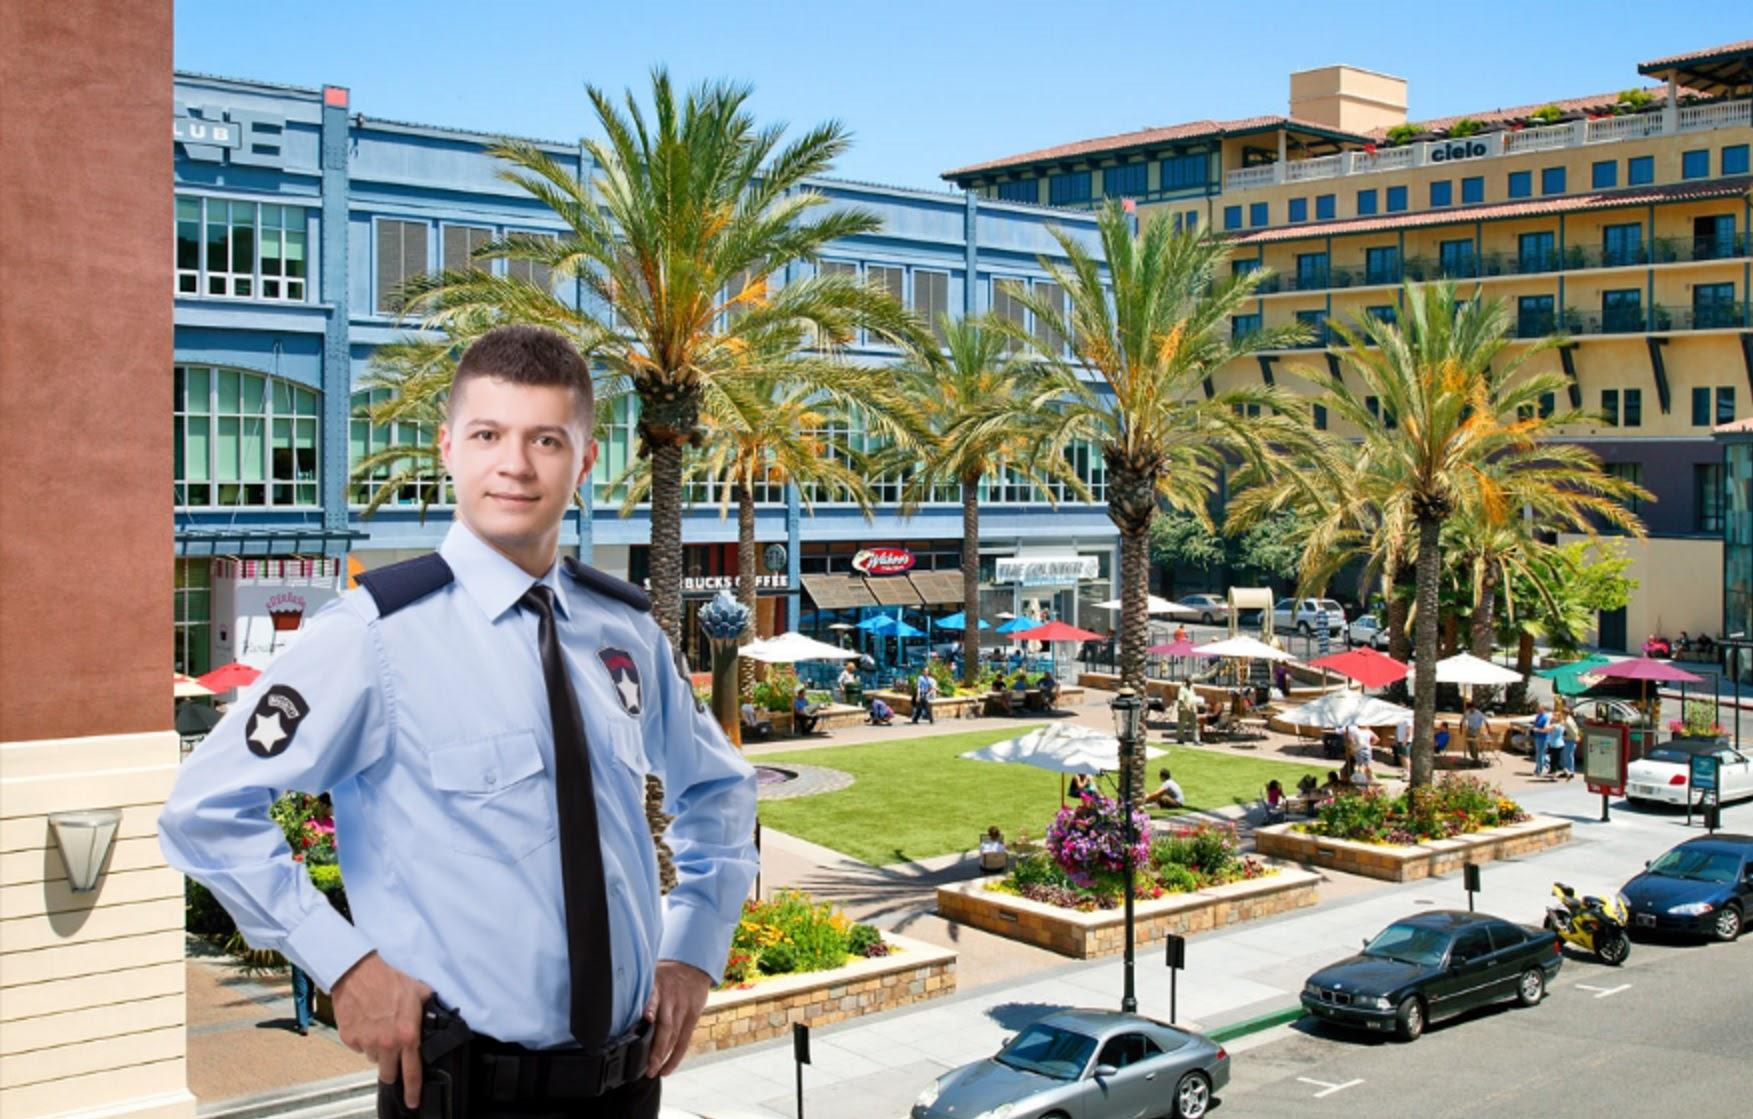 Security Guard Services in San Jose | Security Guards San